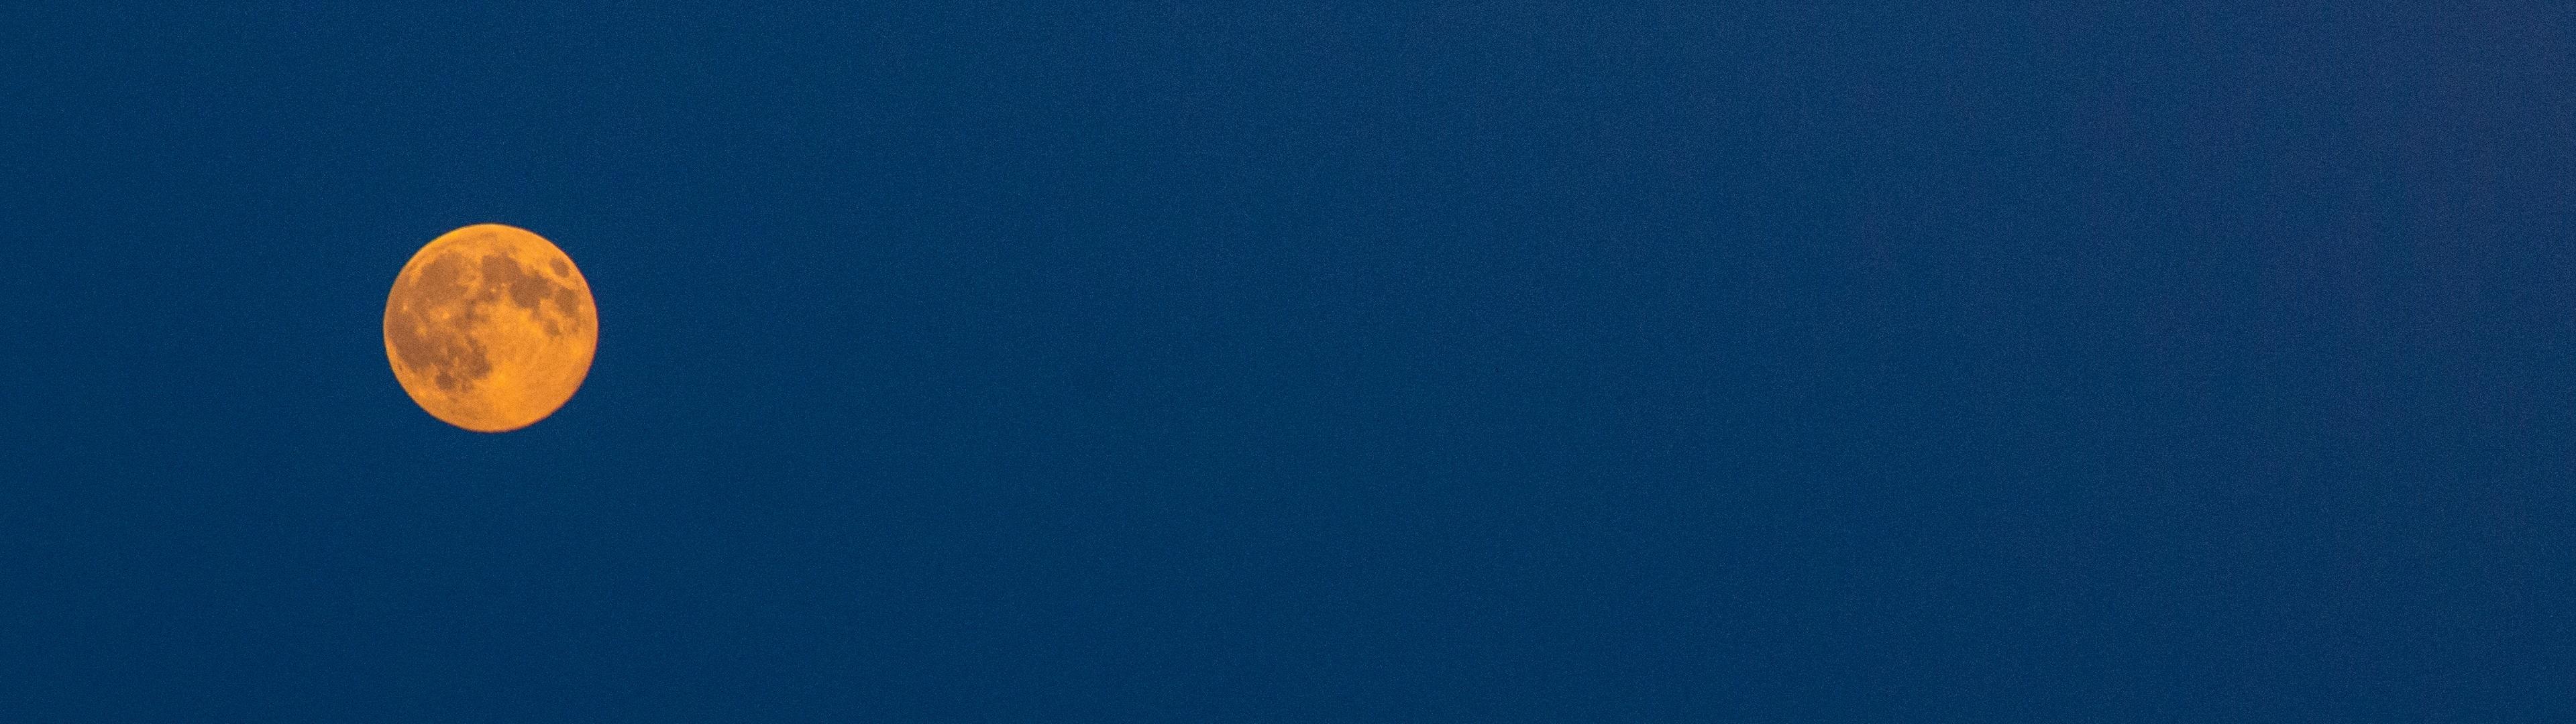 Space – romanian_moon_sky_beautiful_nature_hd-wallpaper-1813045